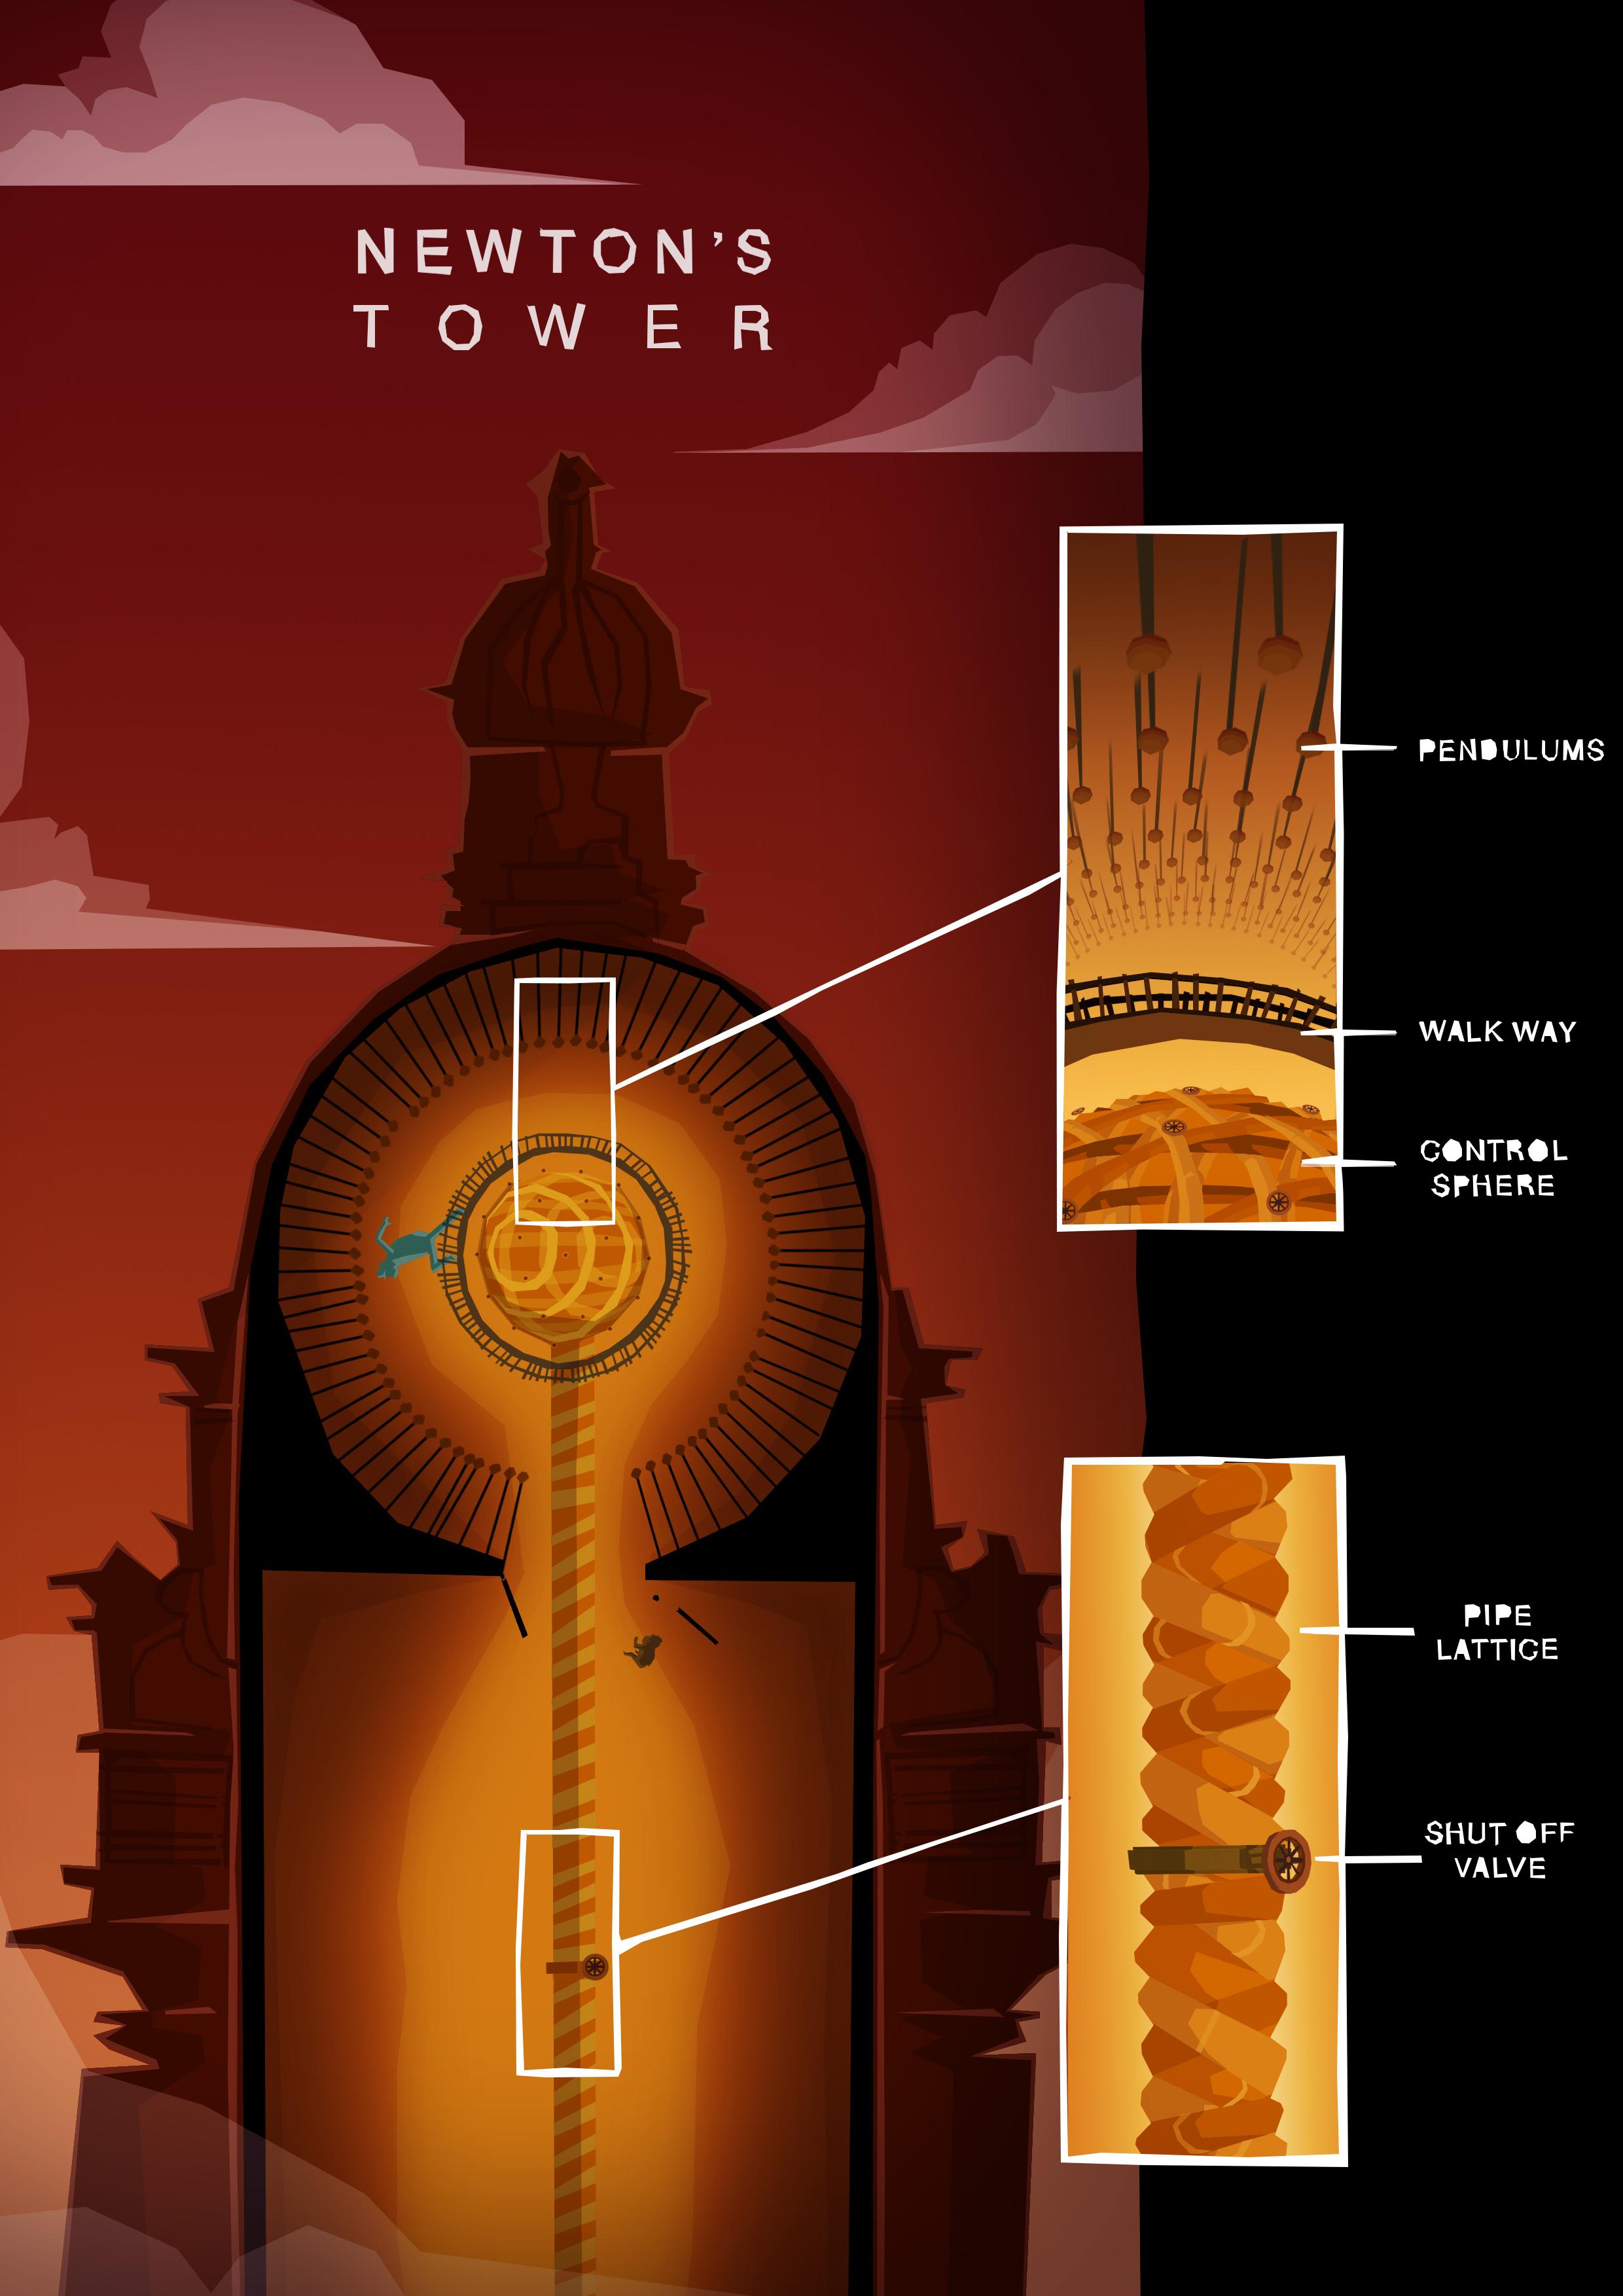 3_The_tower_diagram.jpg